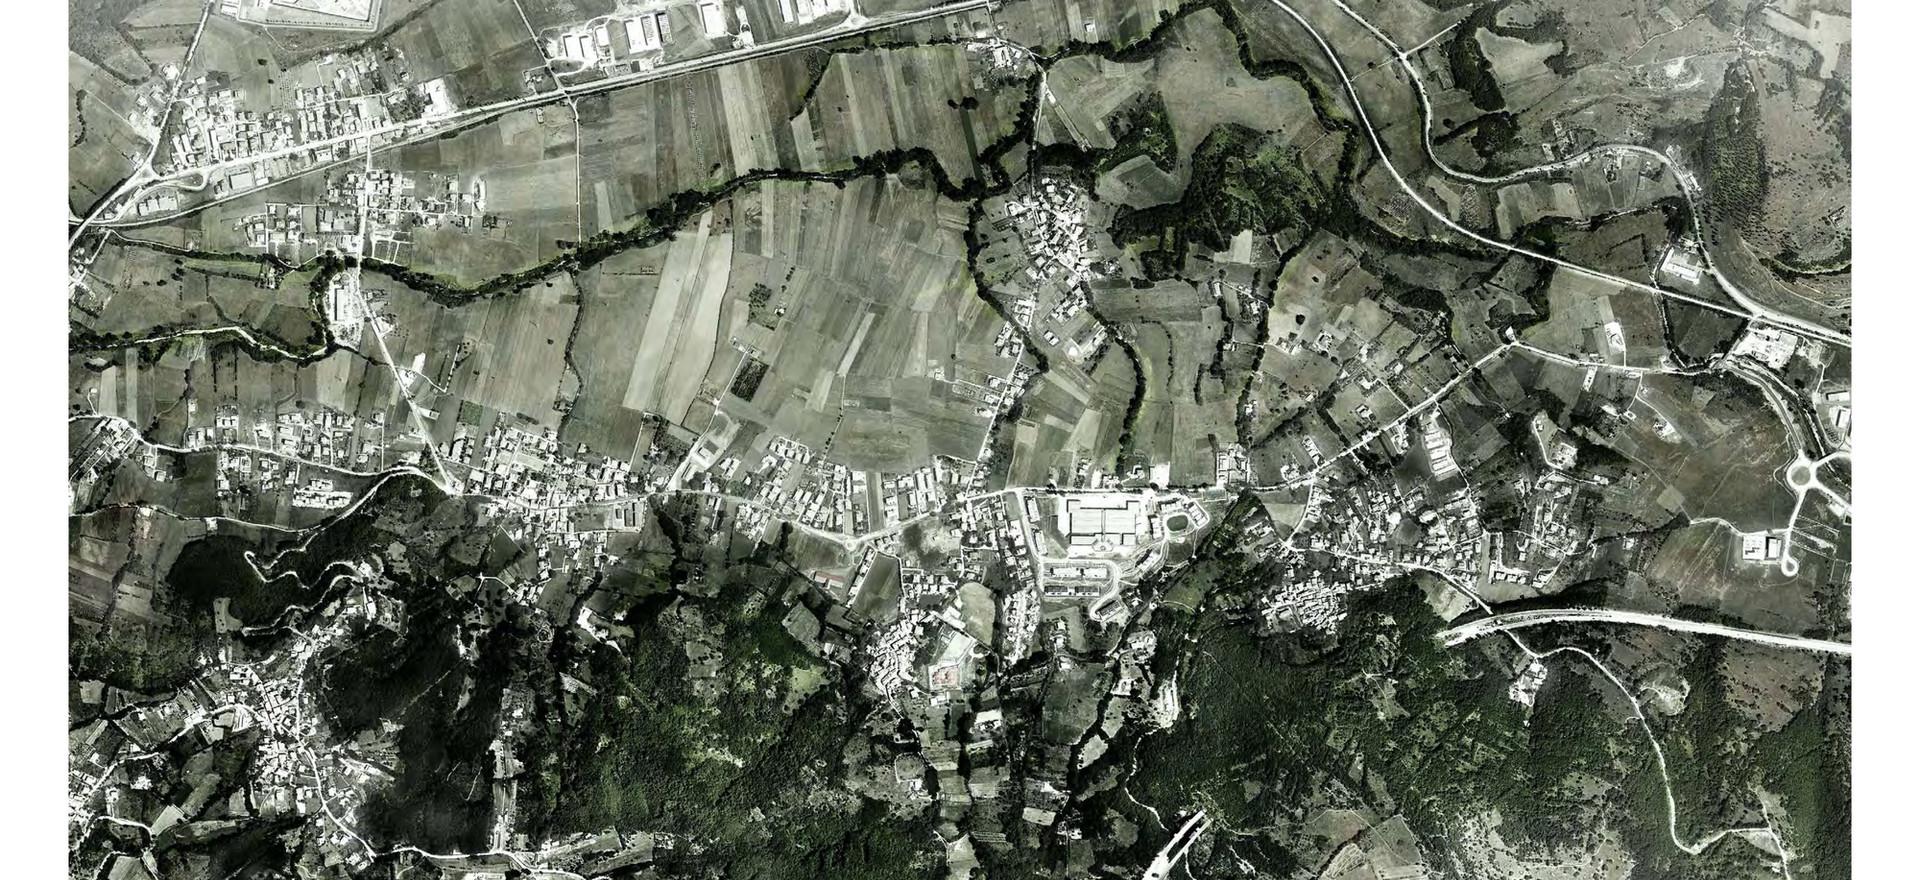 LAP Sassa - inquadramento urbano